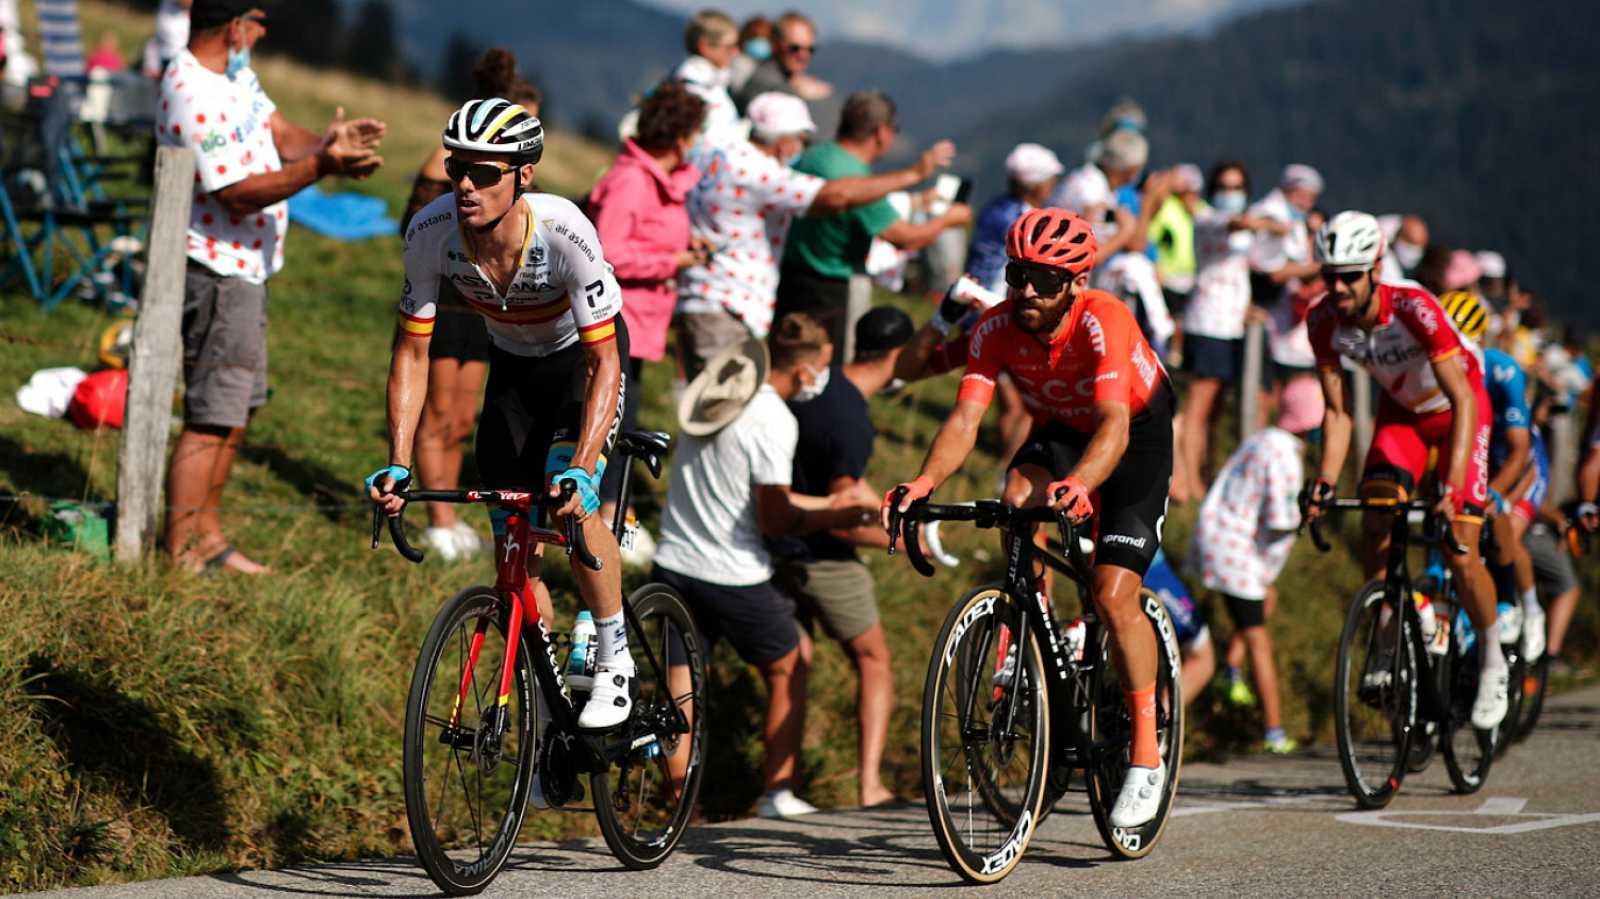 Ciclismo -Tour de Francia - 18ª etapa: Méribel - La Roche-Sur-Foron (1) - ver ahora